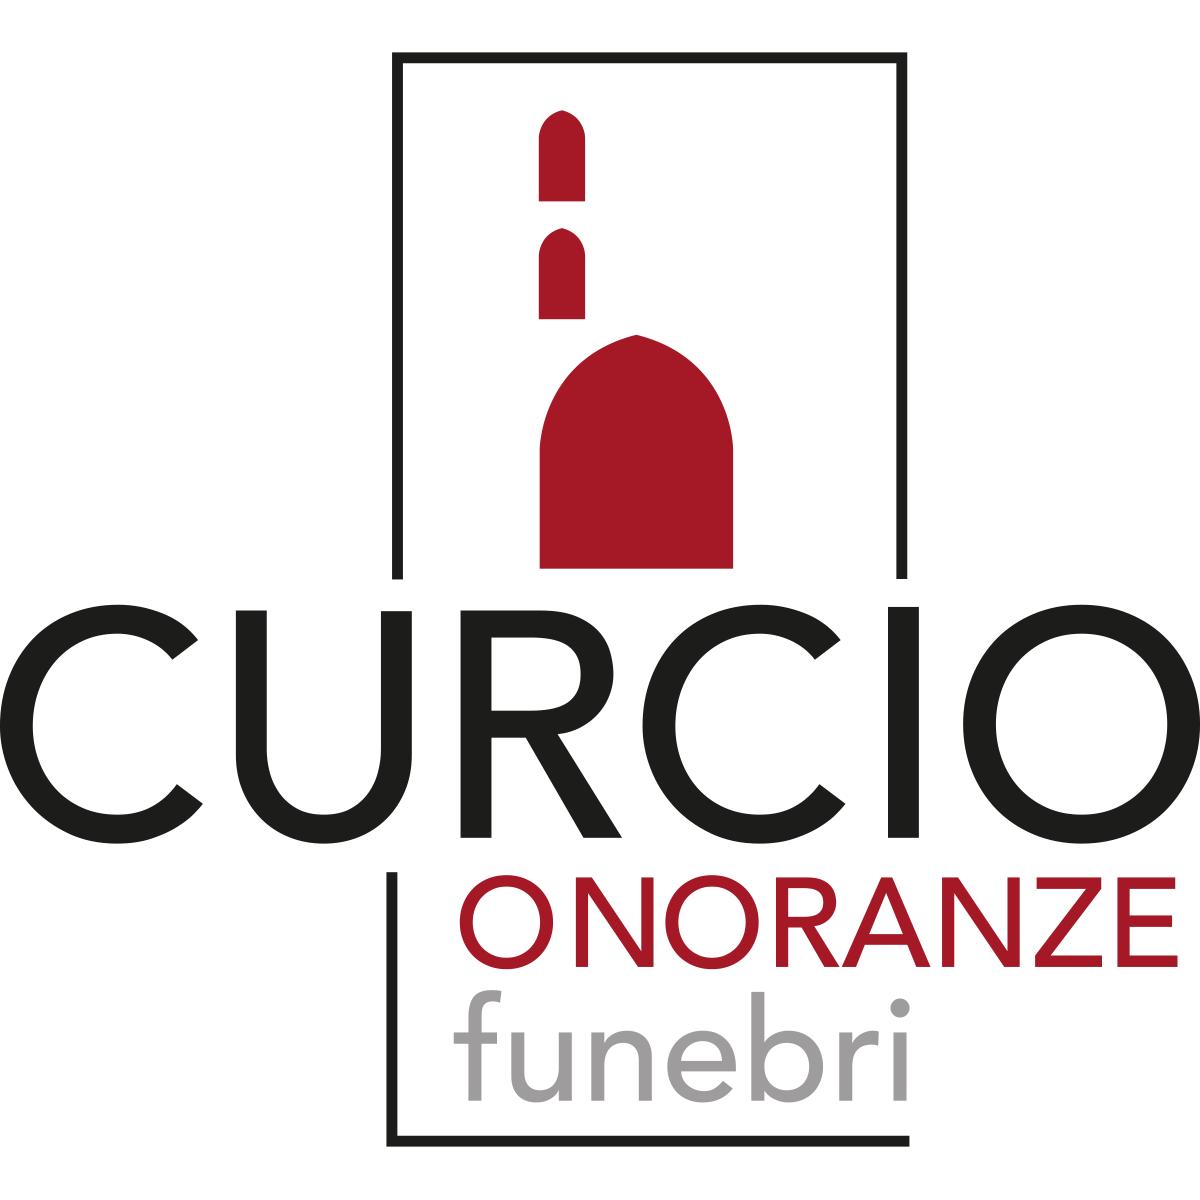 Curcio Onoranze Funebri